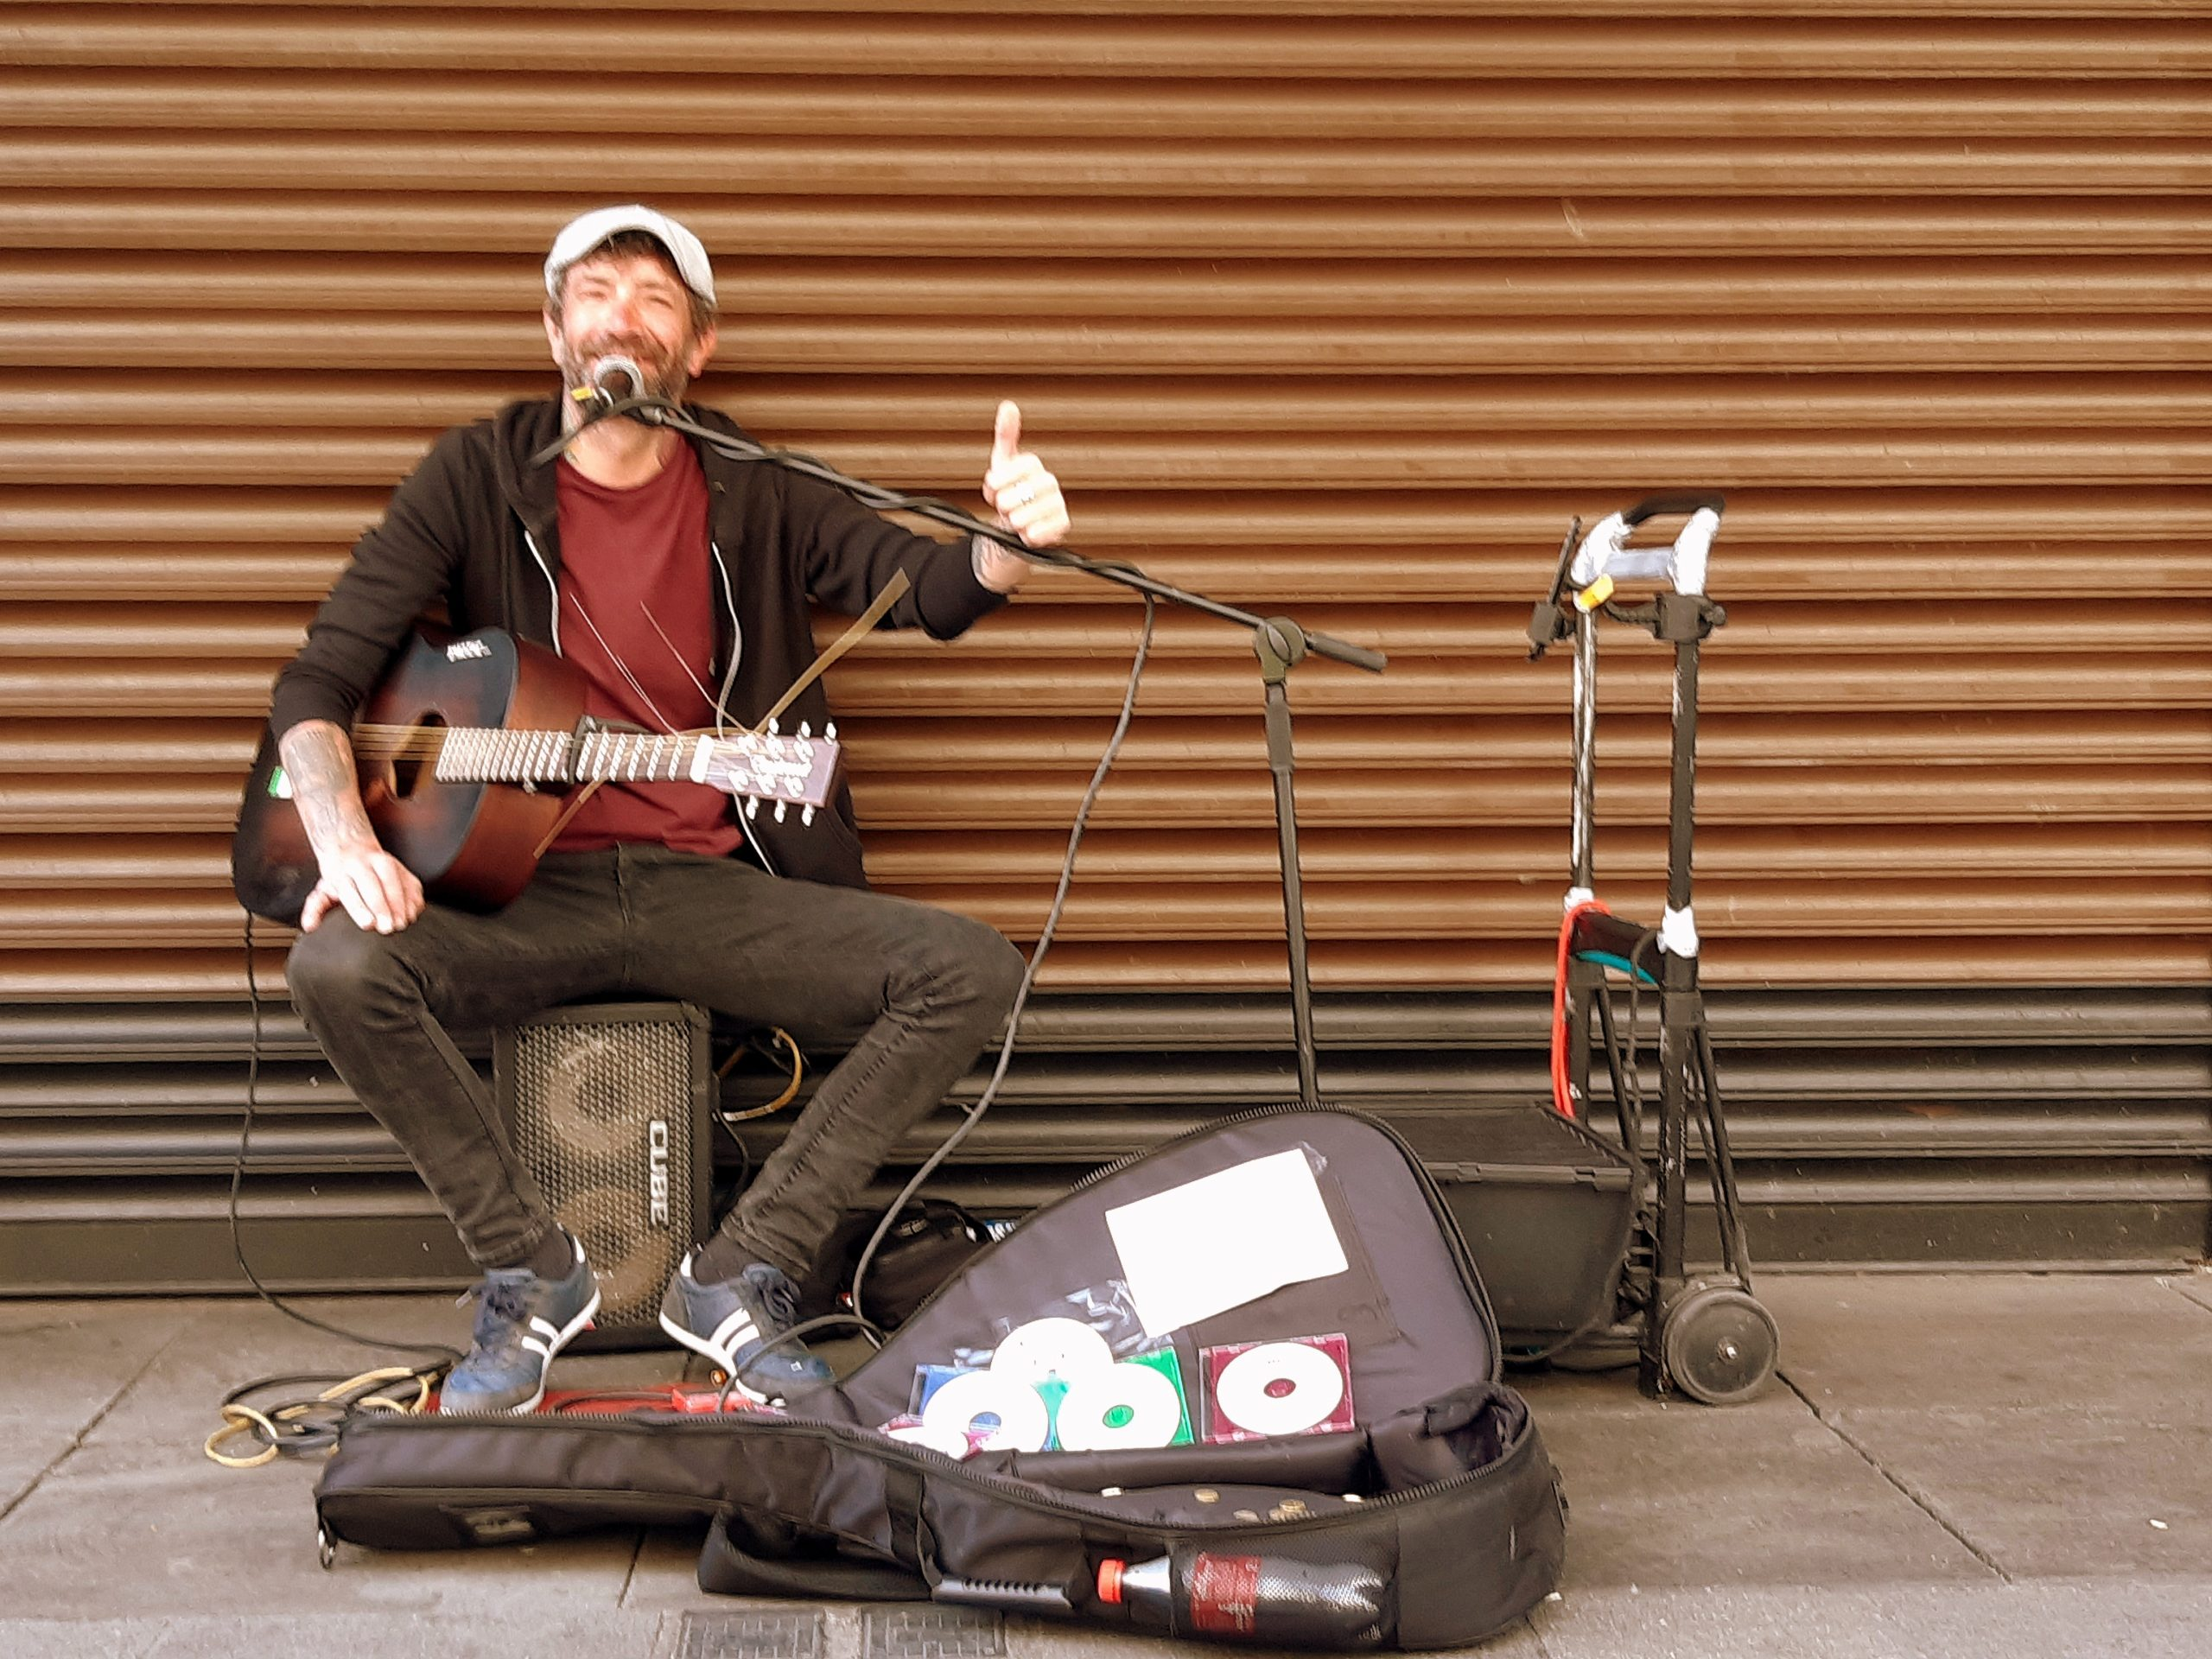 Musicien de rue à Dublin en Irlande